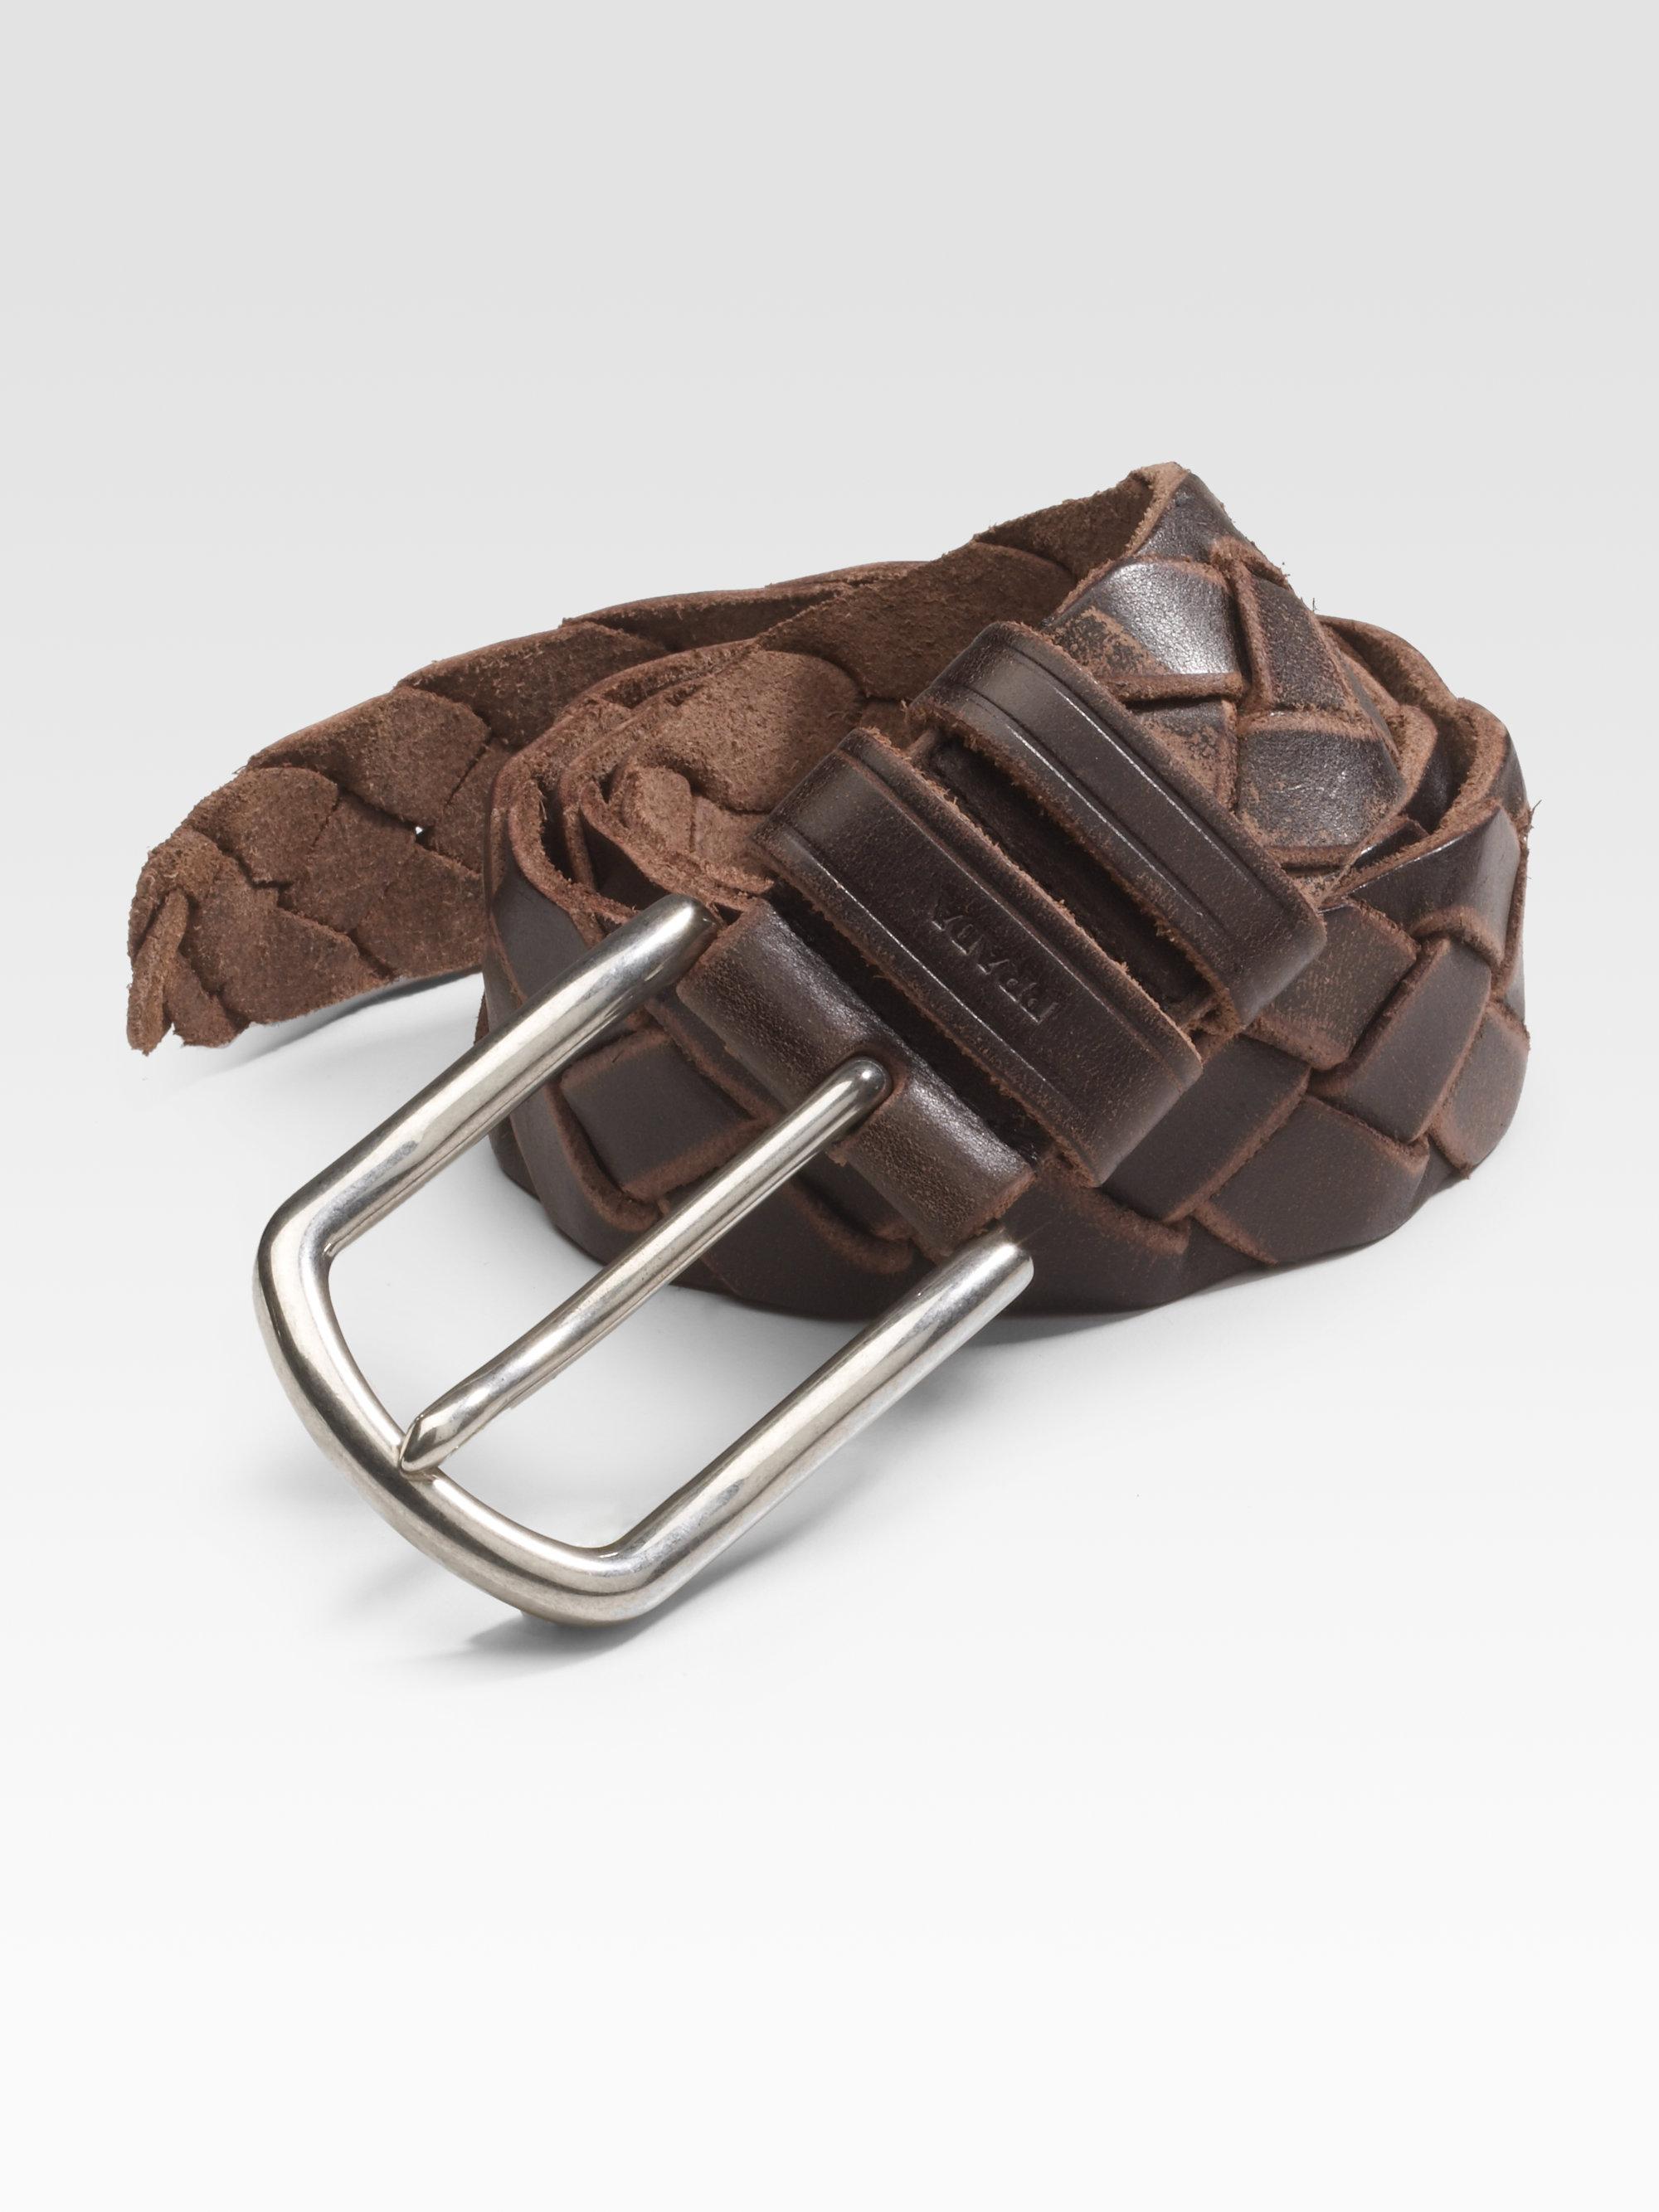 Prada Cuoio Braided Leather Belt in Brown for Men | Lyst